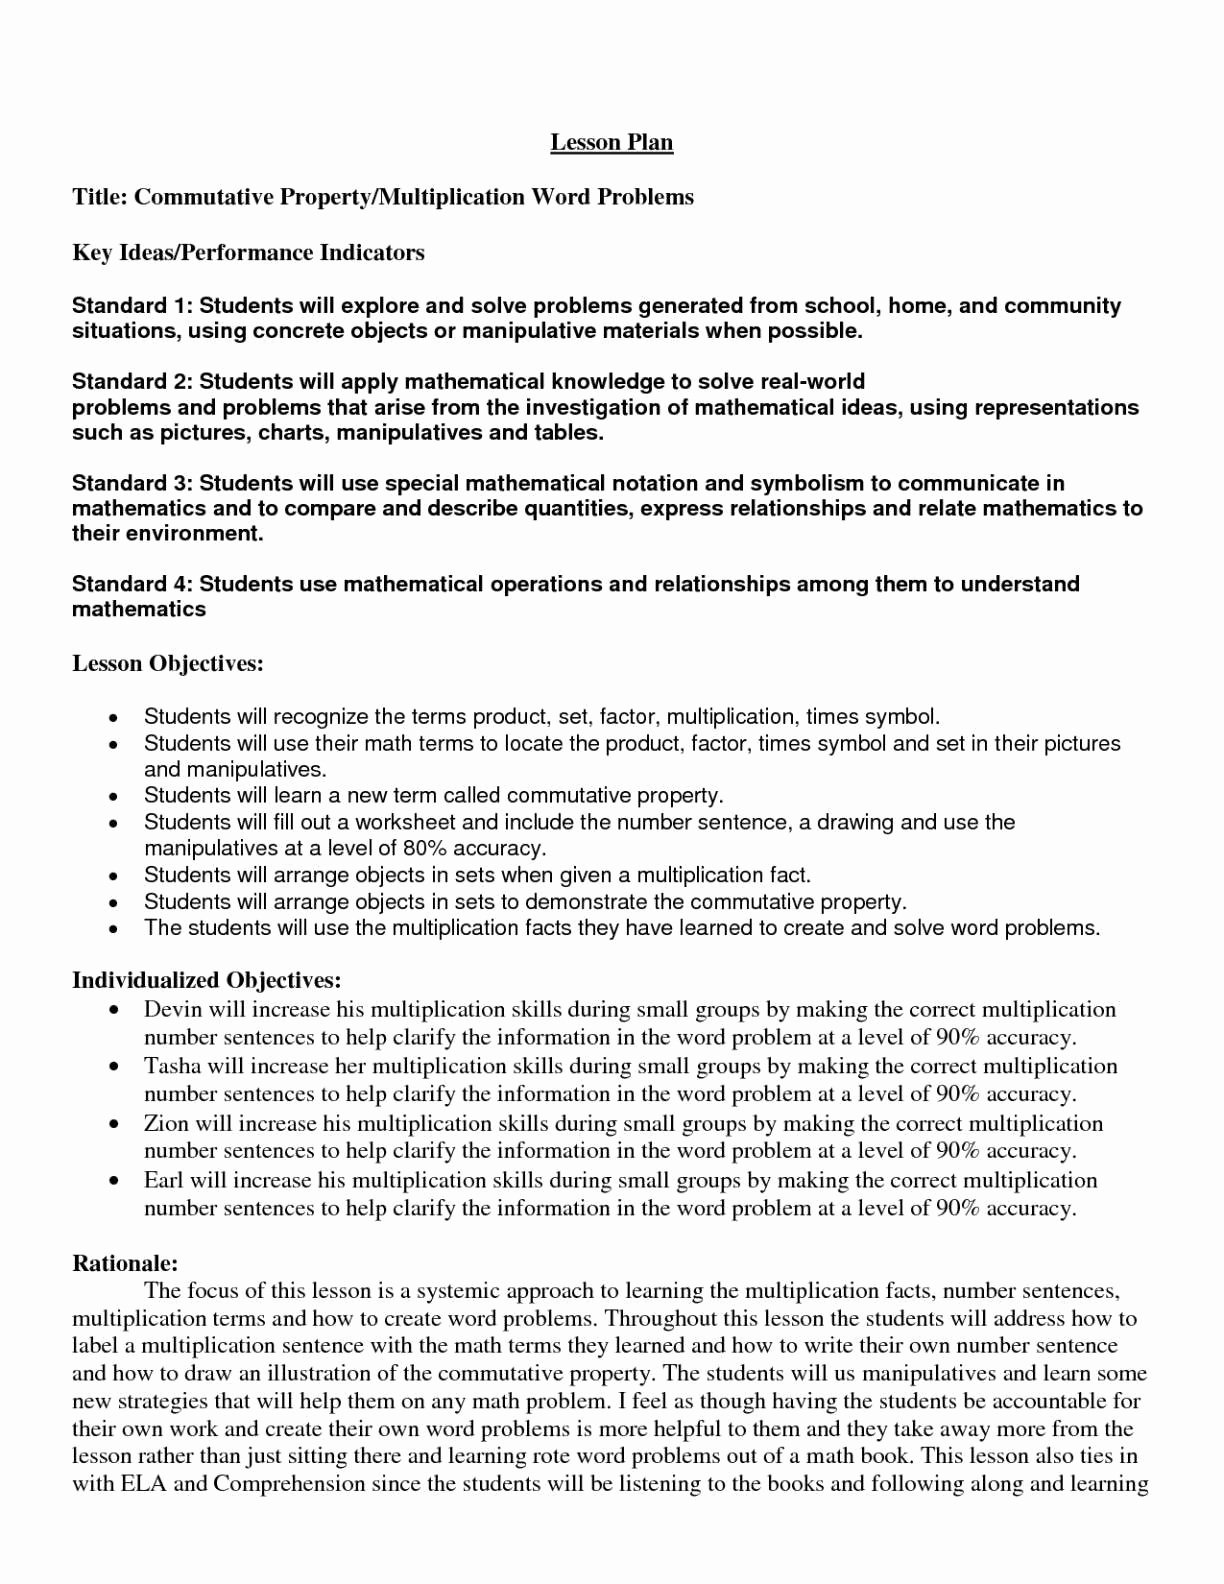 Distributive Property Worksheet Pdf Inspirational Distributive Property Worksheet Answers Worksheet Idea